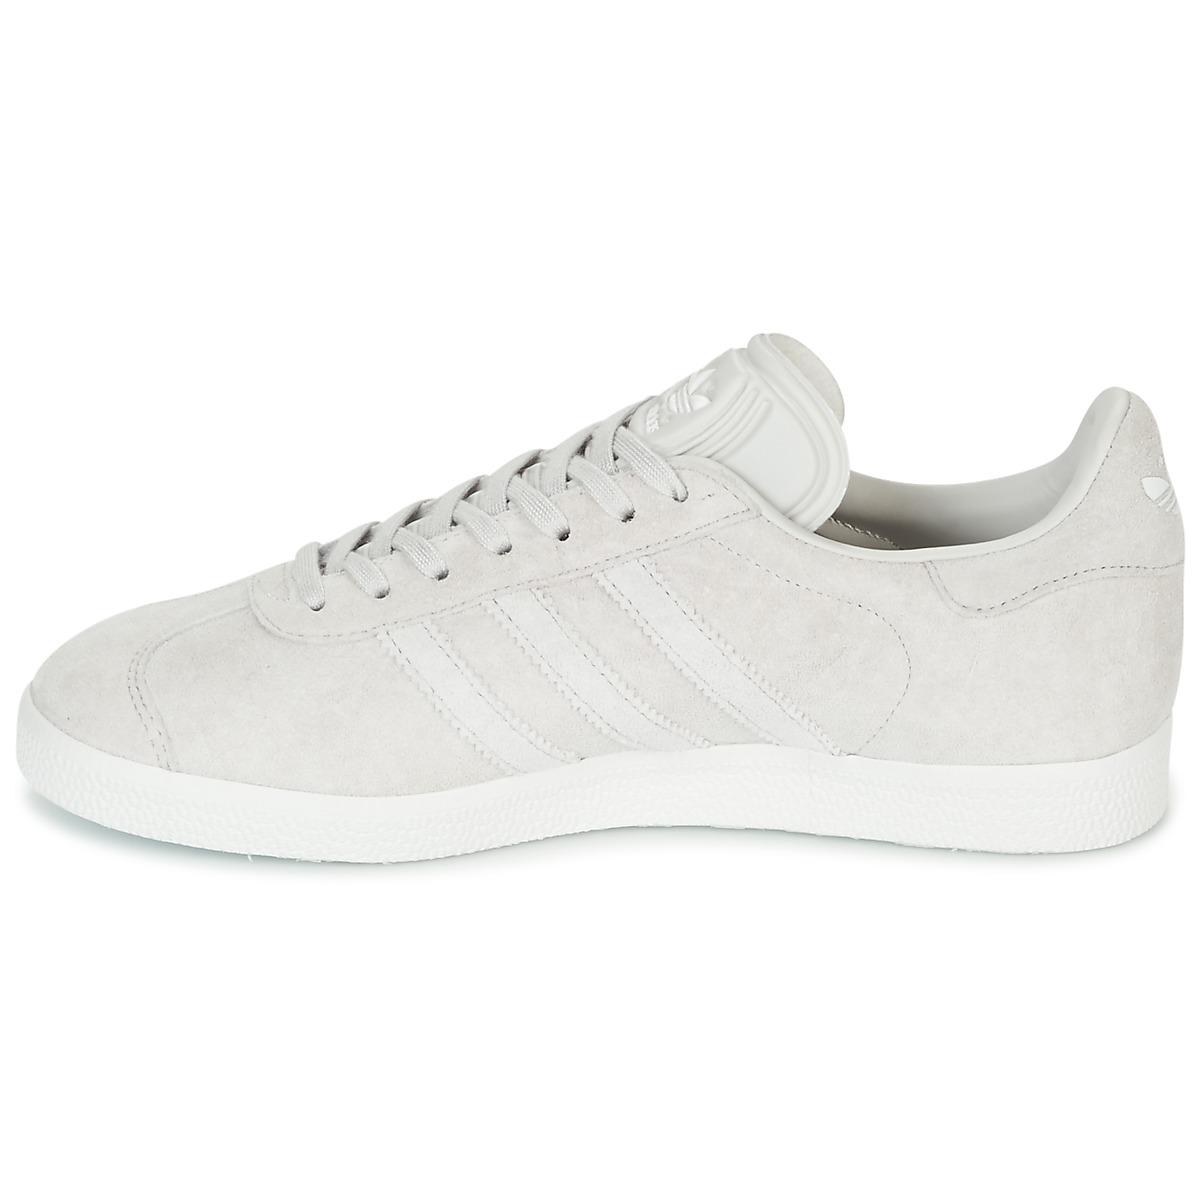 adidas gazzelle scarpe donna